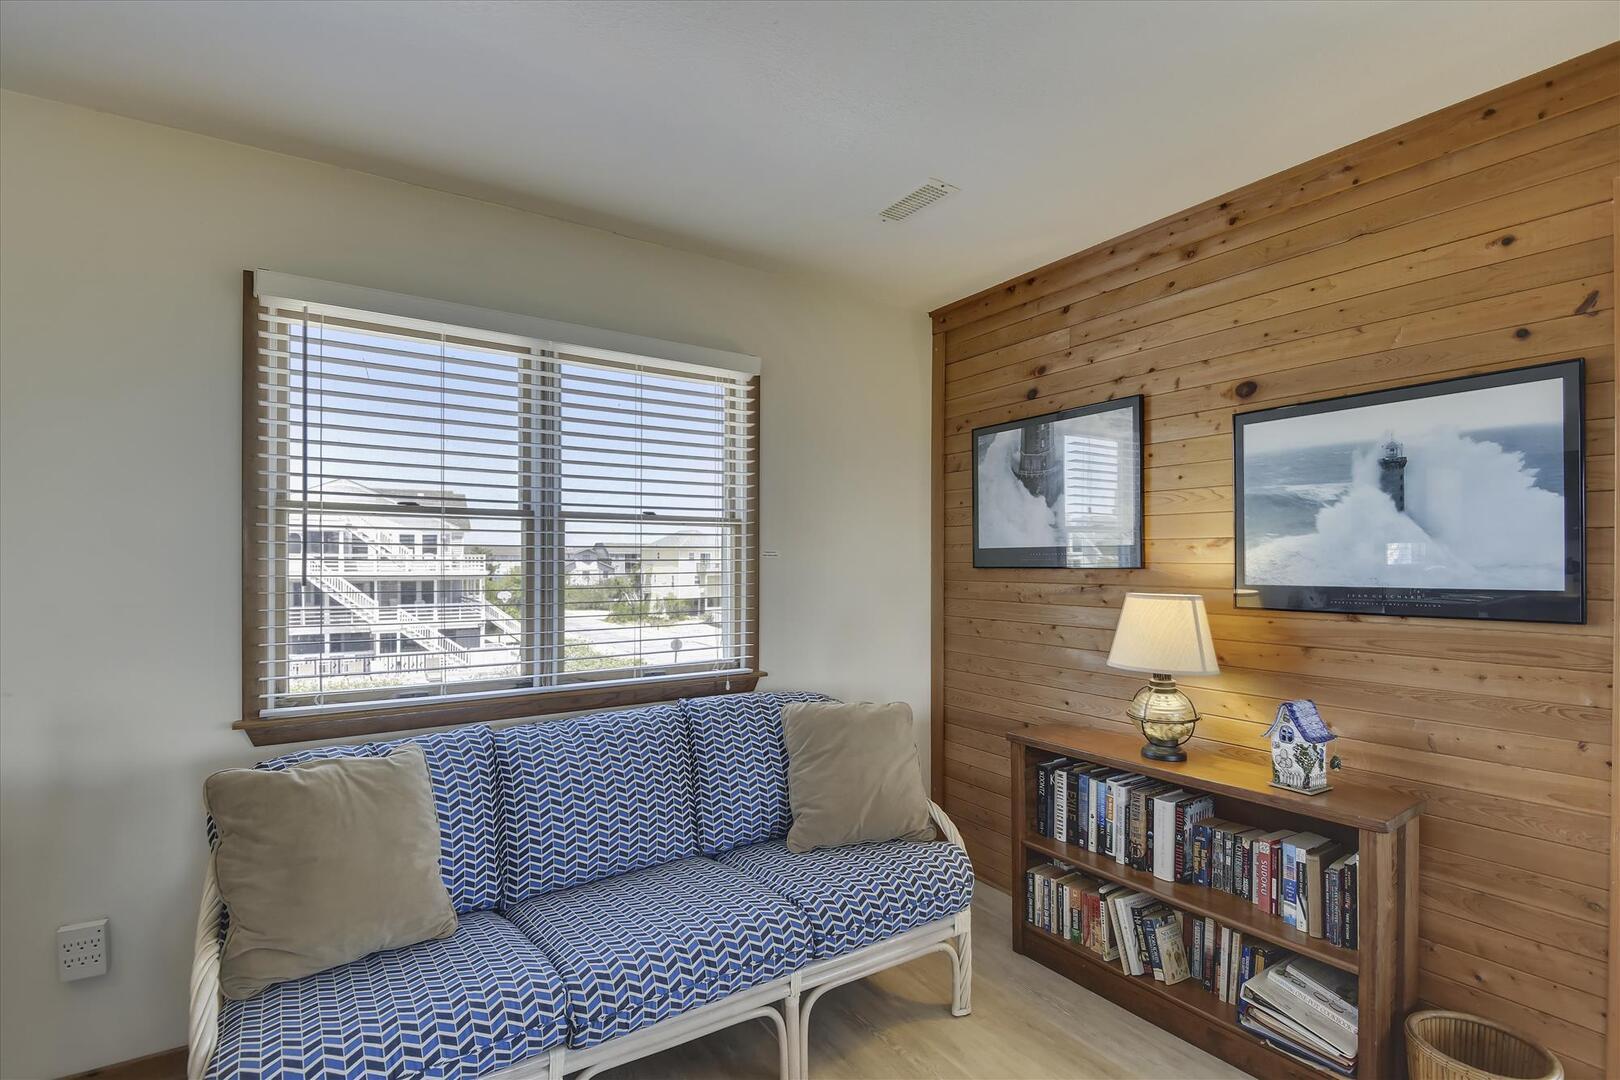 Main/Upper,Living Area,